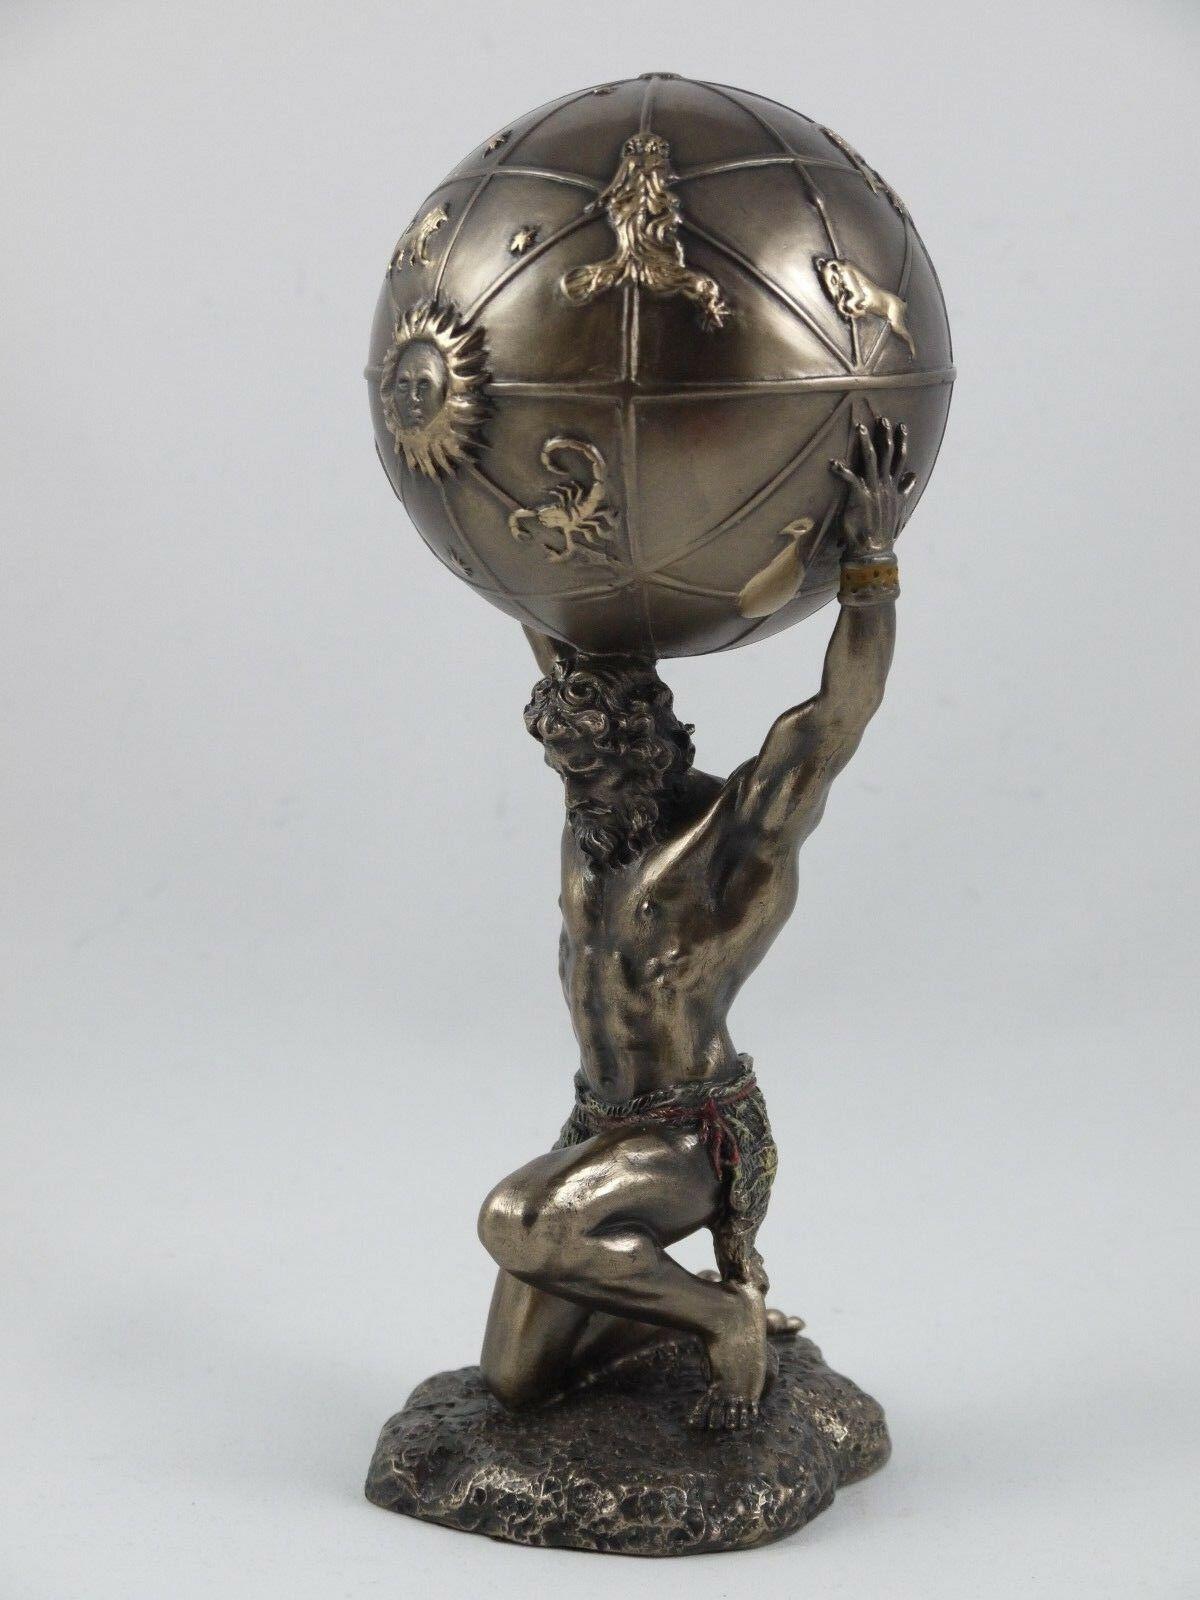 Atlas Carrying The World Greek God Statue Bronze Finish Figurine Sculpture 8 26